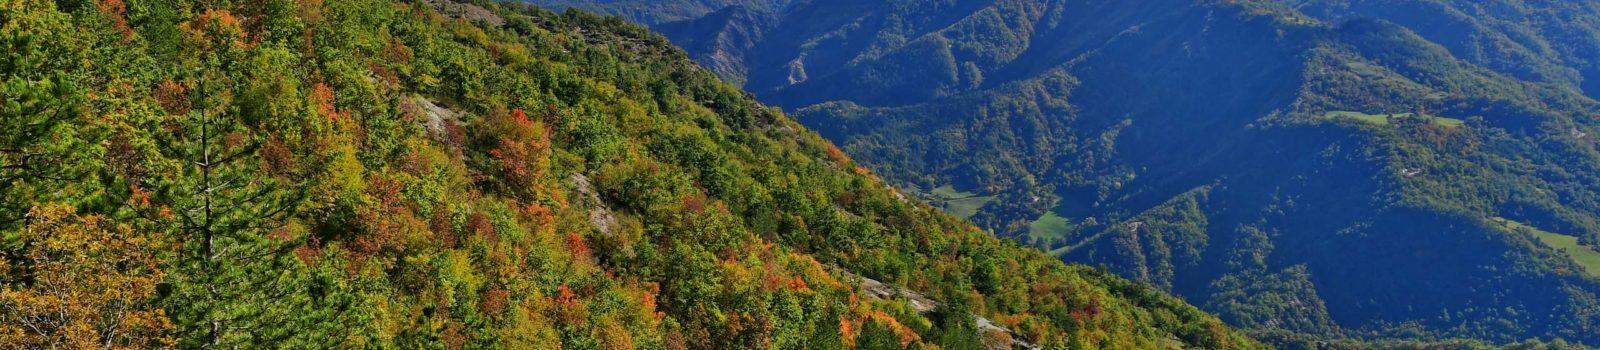 Bike-Tour um den Lago di Ridracoli in der Emilia-Romagna